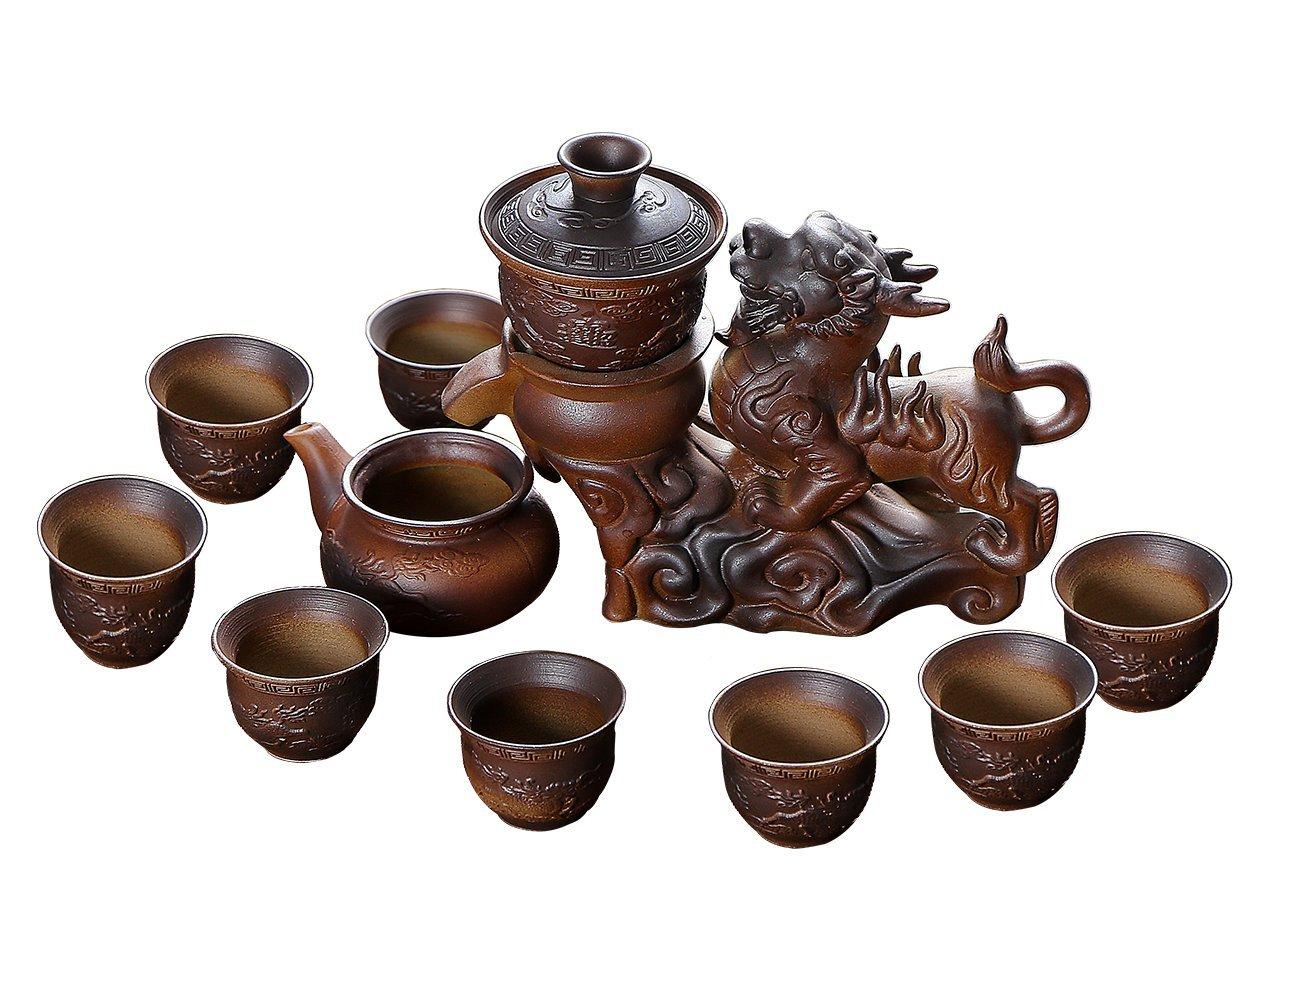 Ufine Chinese Gift Tea Service Ceramic Firewood Coarse pottery Kylin Fortune Automatic Handmade Dehua Porcelain Kongfu Hot Tea Set of 11 Gift Box for Business Friend Adult Men